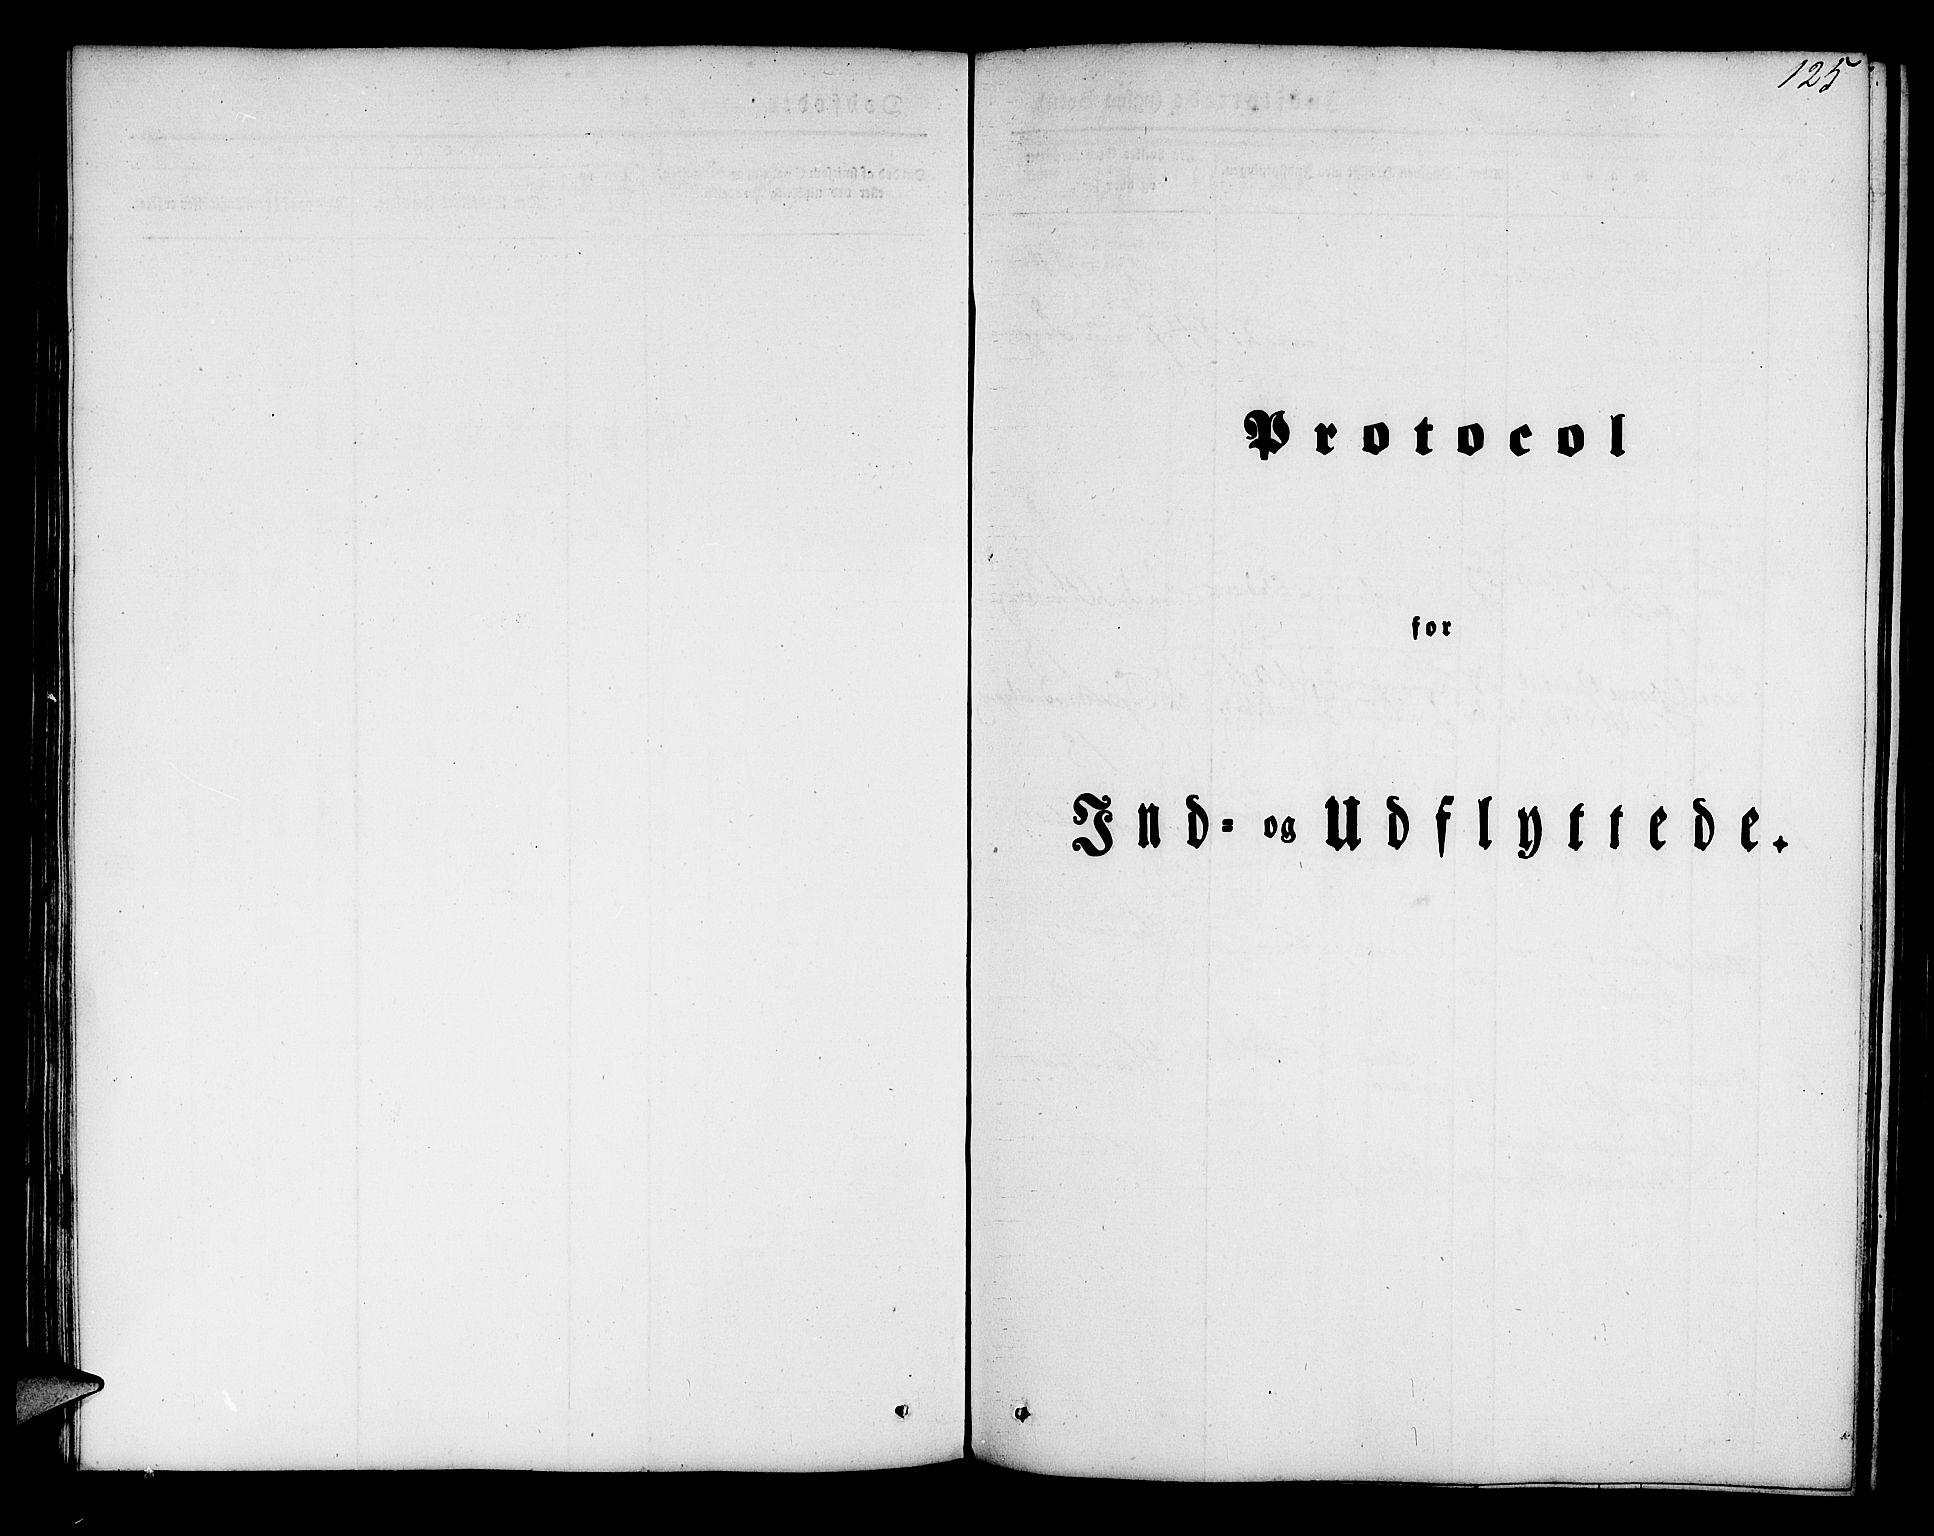 SAB, Mariakirken Sokneprestembete, H/Hab/L0002: Klokkerbok nr. A 2, 1846-1862, s. 125